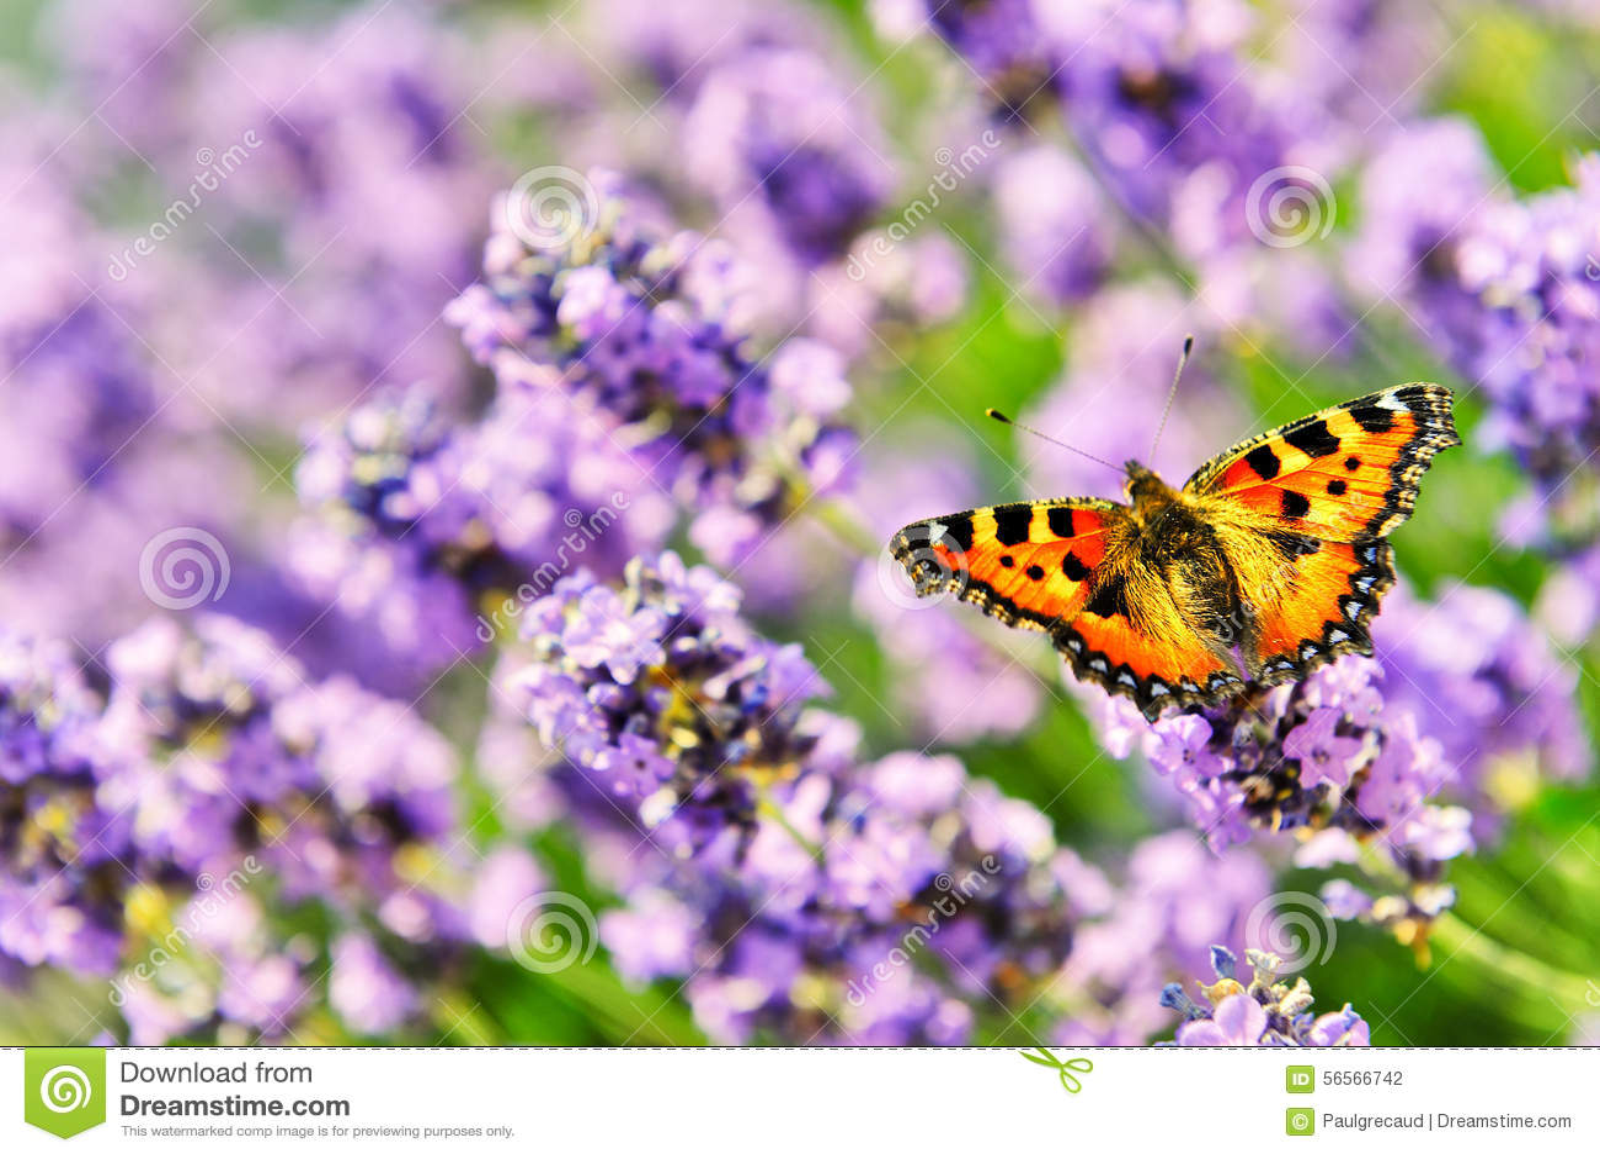 Download Πεταλούδα στα ανθίζοντας Lavender λουλούδια Στοκ Εικόνες - εικόνα από χρώμα, armstrong: 56566742